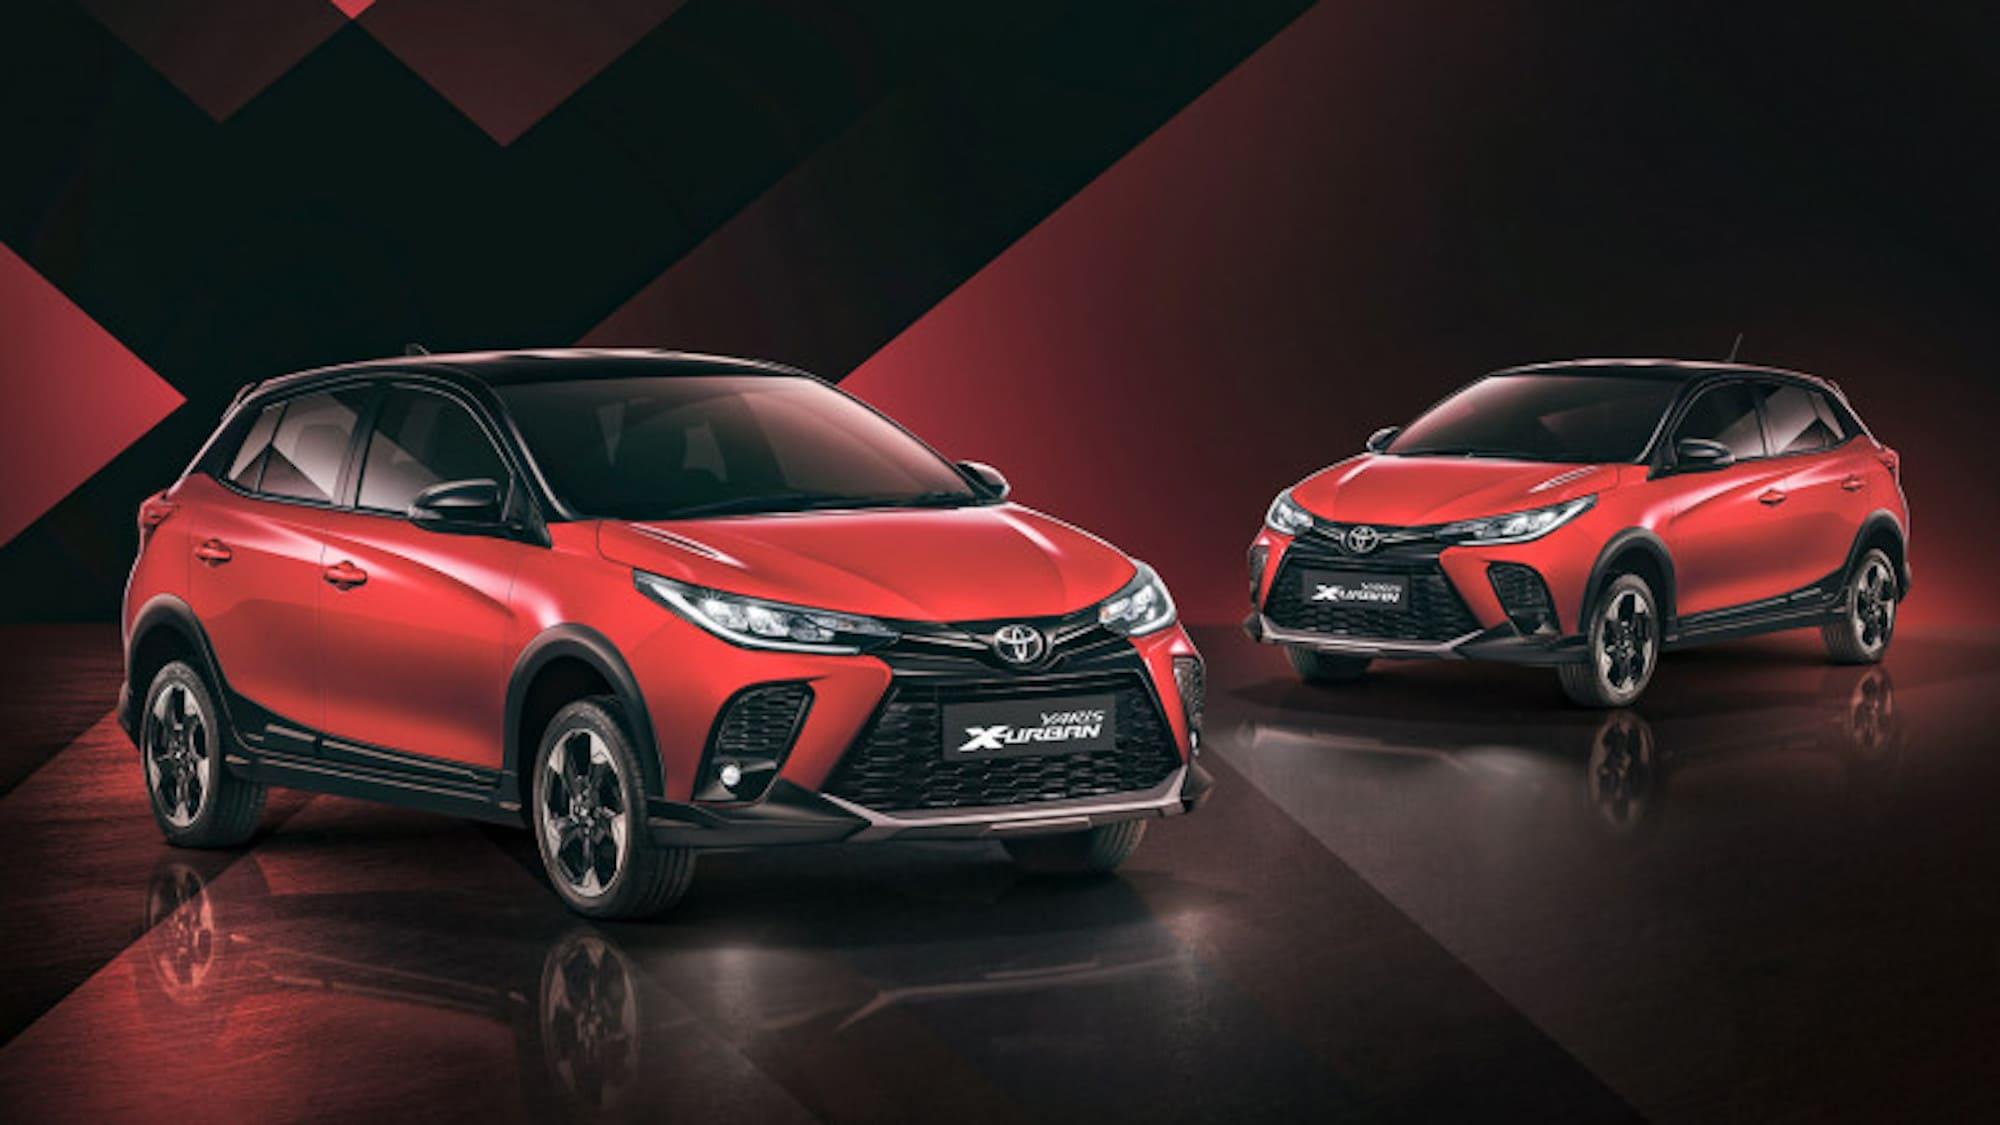 2021 Toyota Yaris X Urban Thailand 3 768x432 1